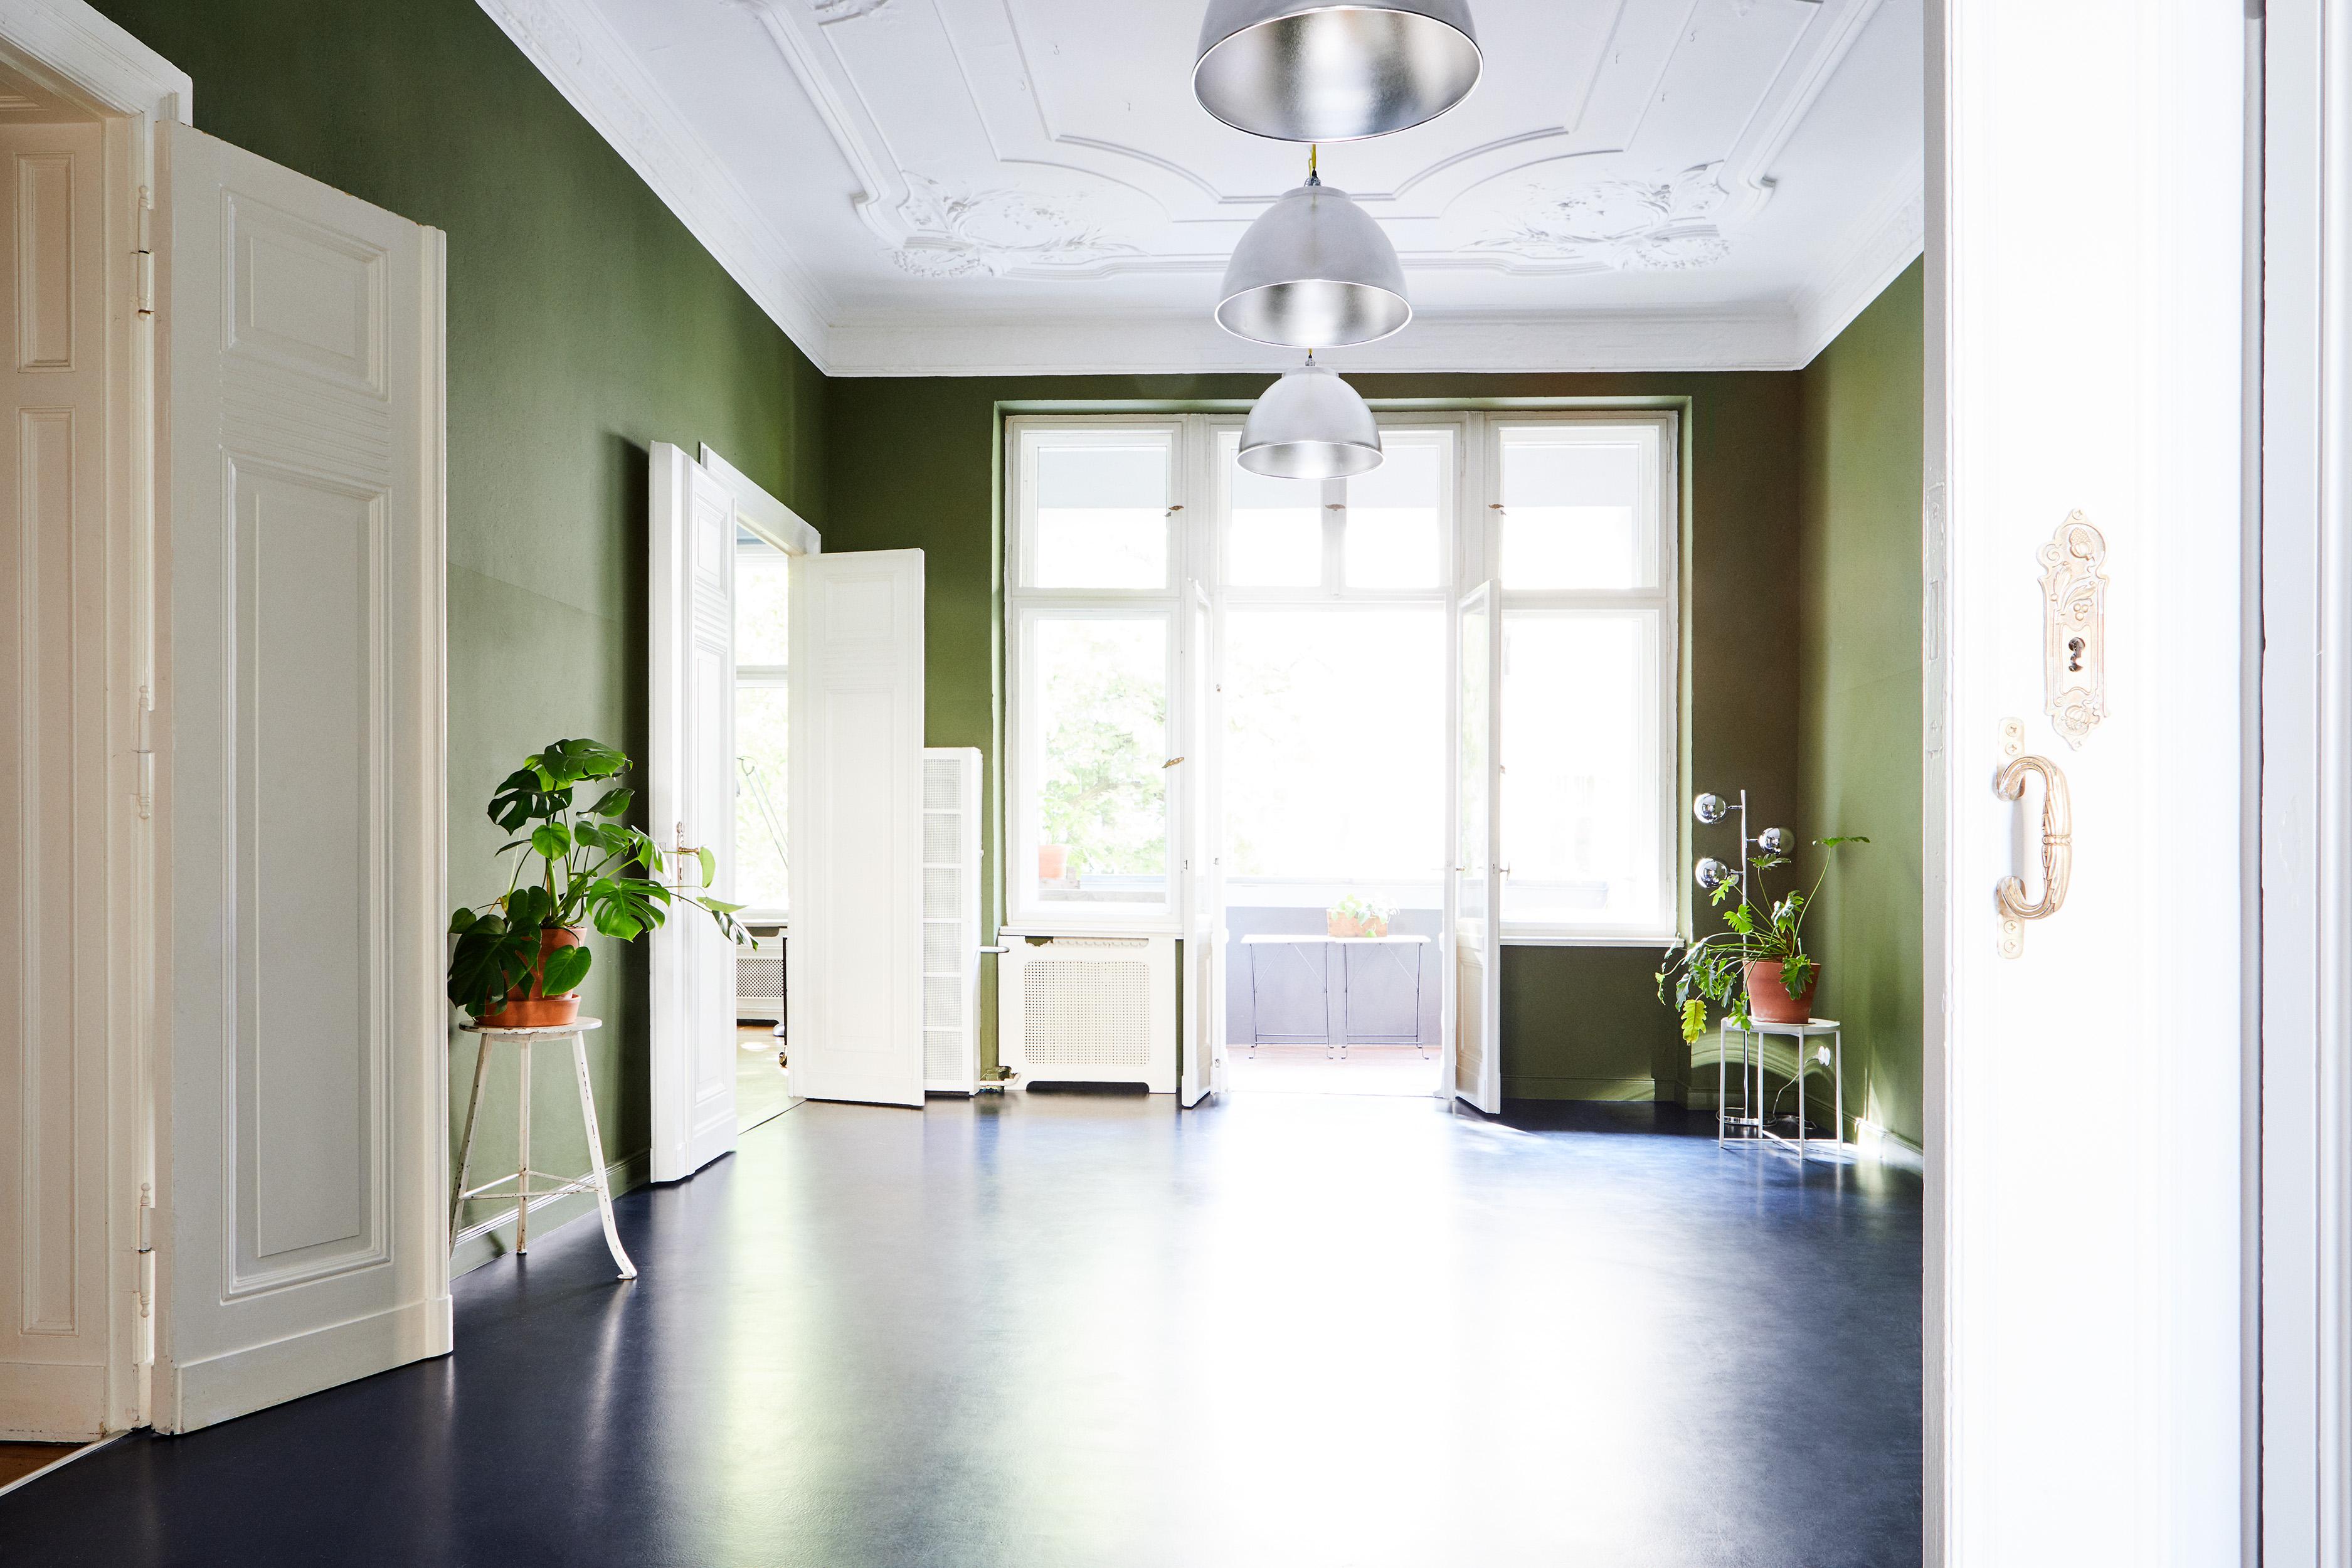 Foto eines leeren Altbauzimmers